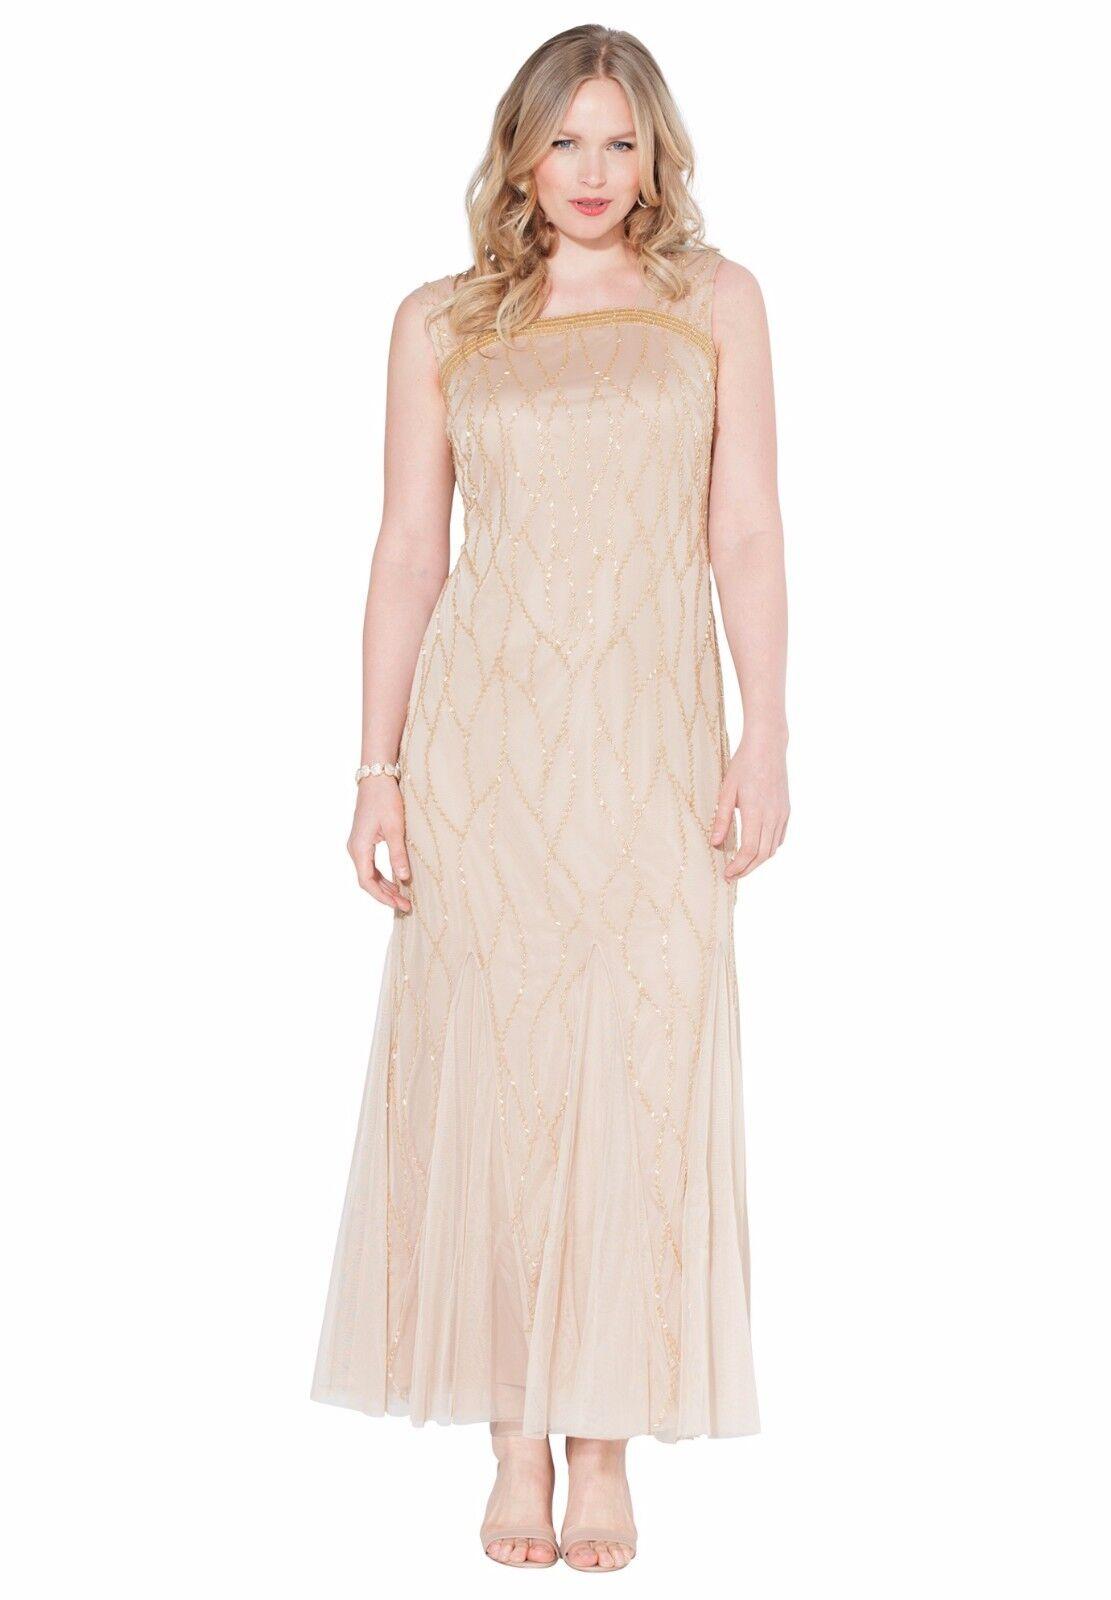 Beaded Goddess Full Length Dress Sparkling Champange 14W - 24W Plus Größe